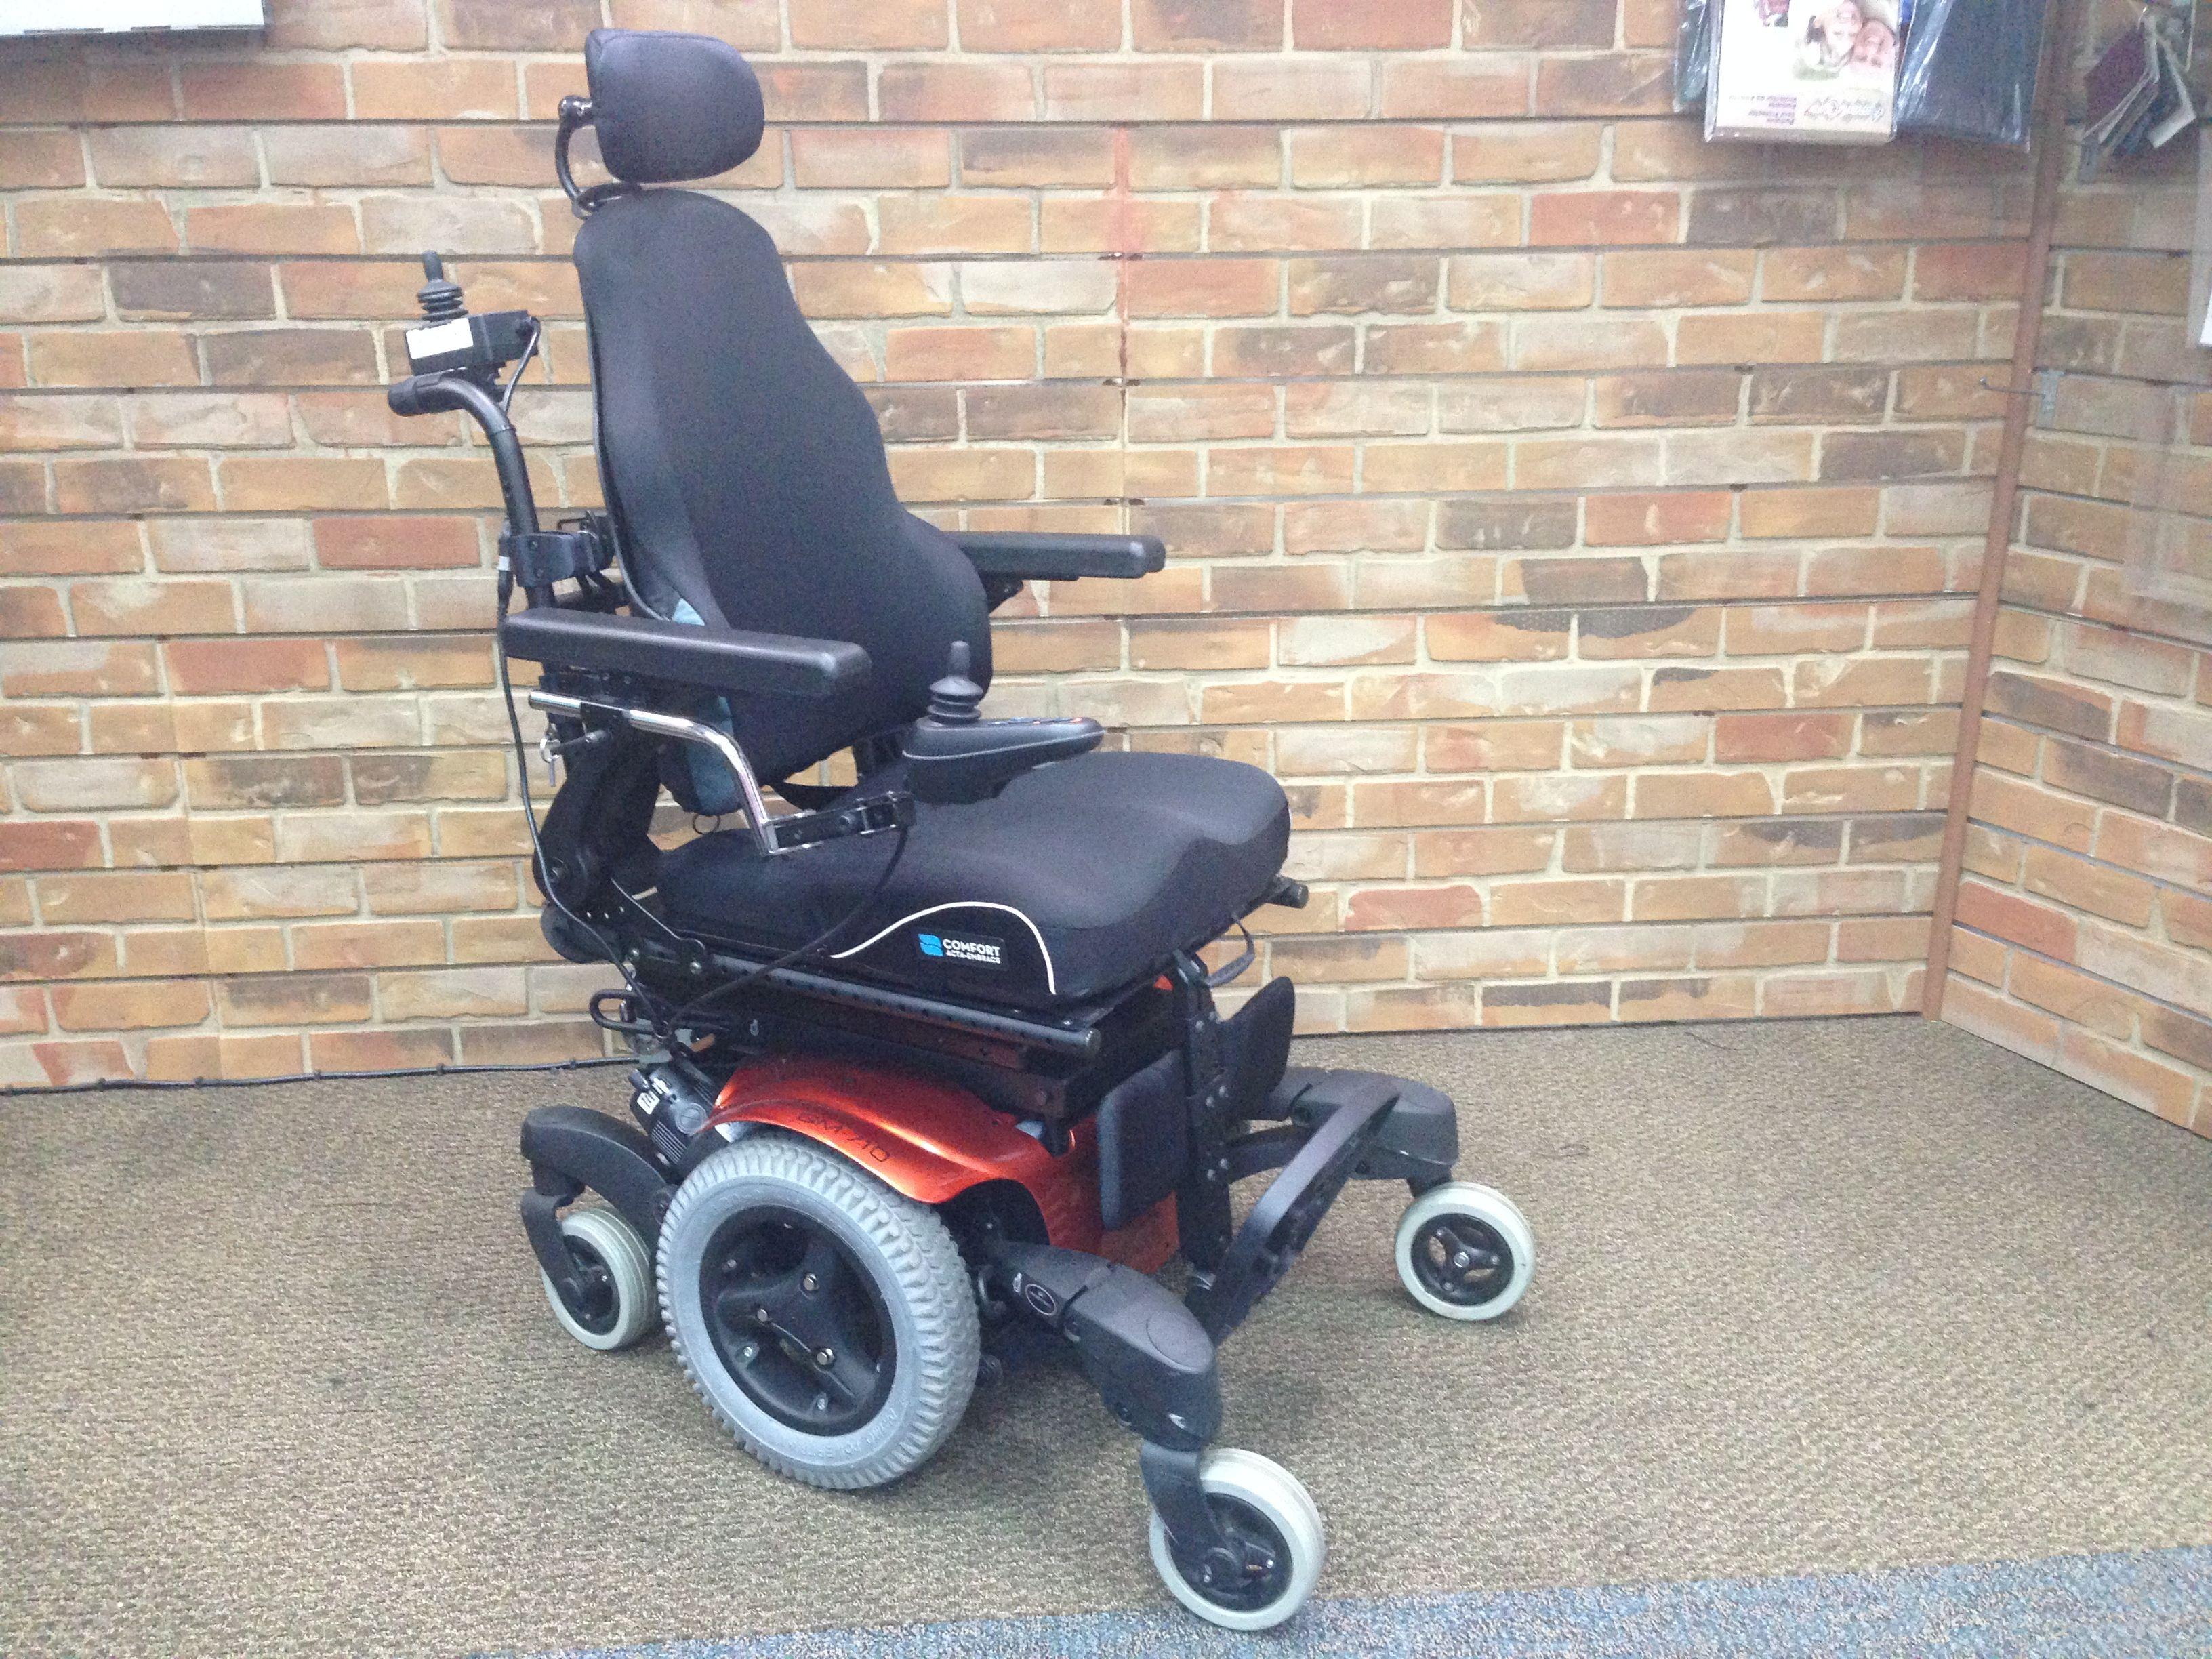 Quickie QM710 Power Tilt Rehab Power Chair (New) For Sale